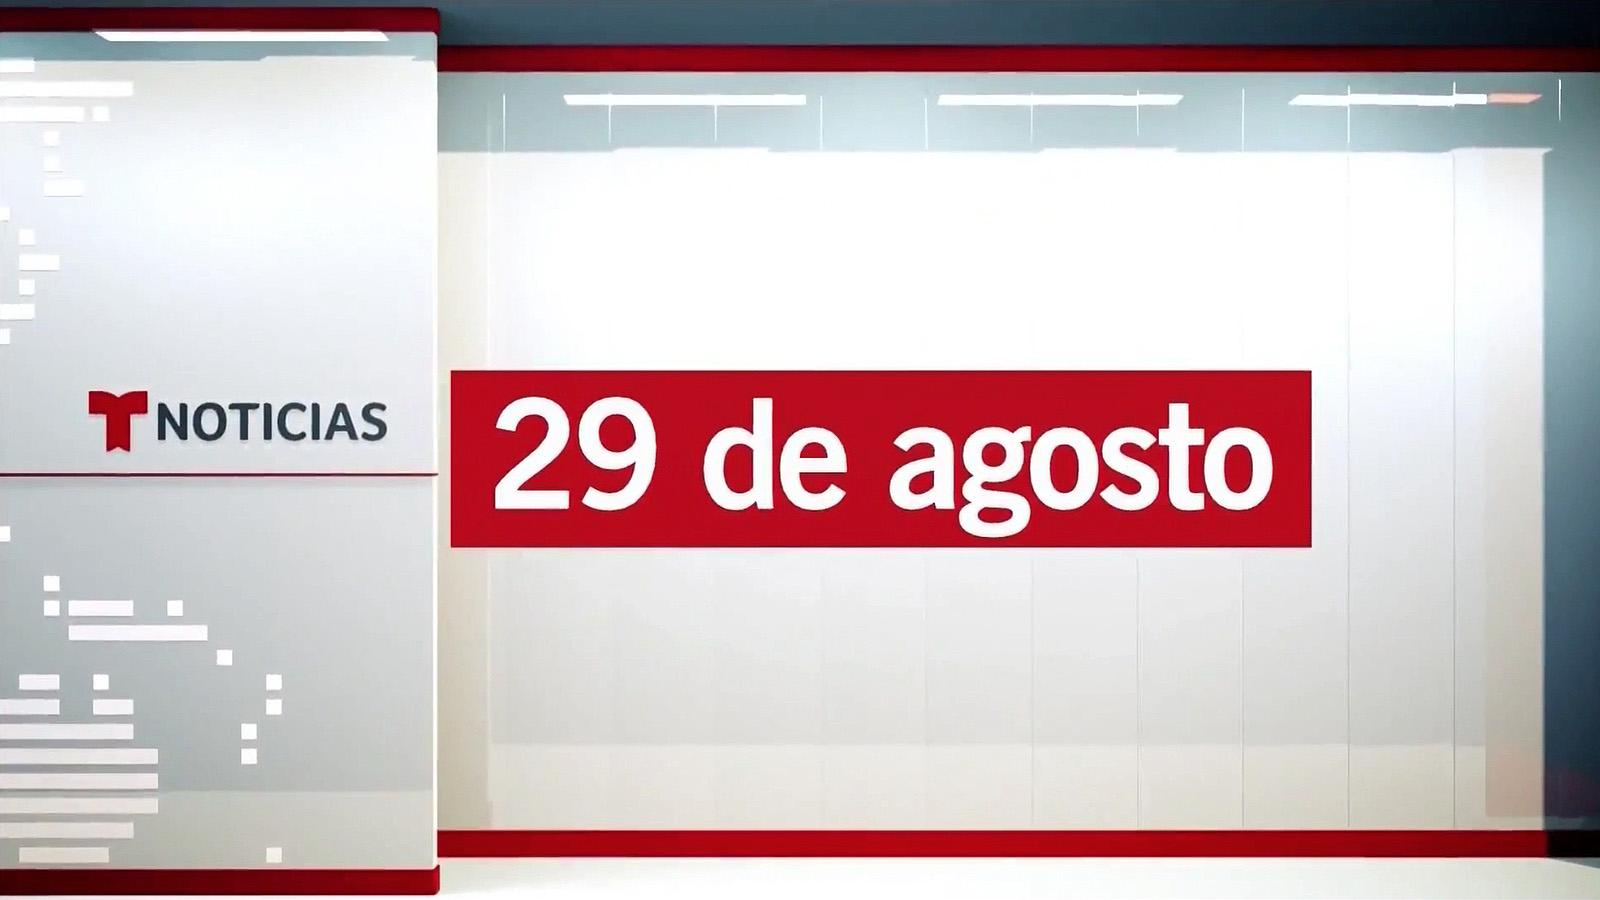 NCS_Noticias-Telemundo-Design_0003